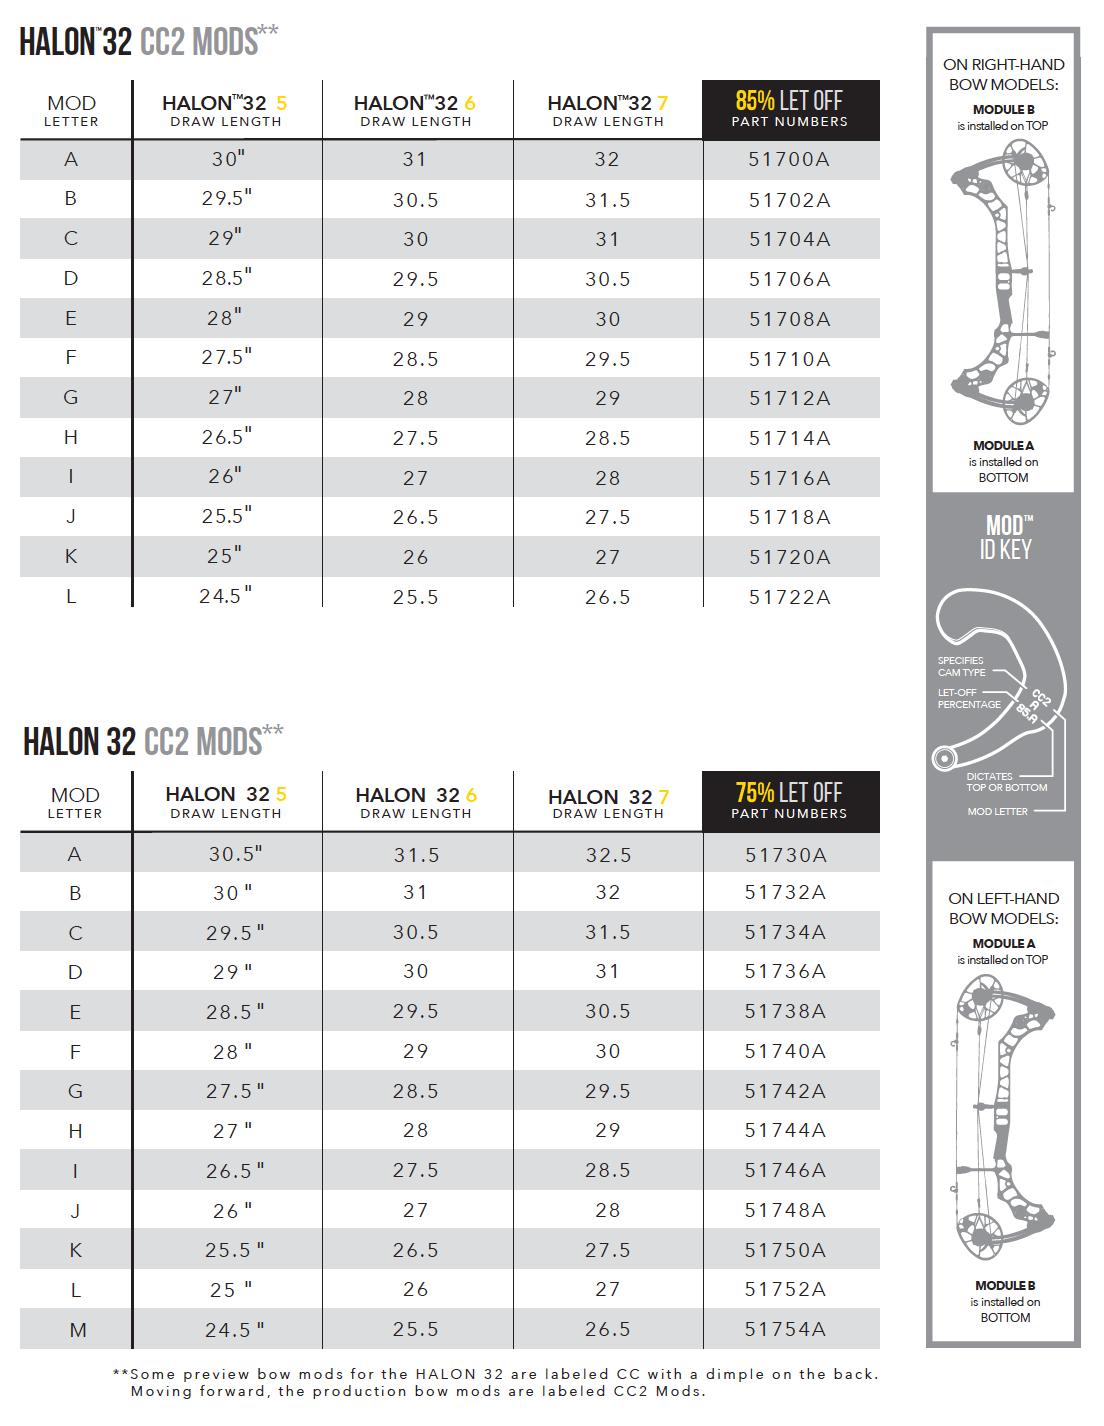 Mathews Triax / Halon 32 Modules Draw Length Kits